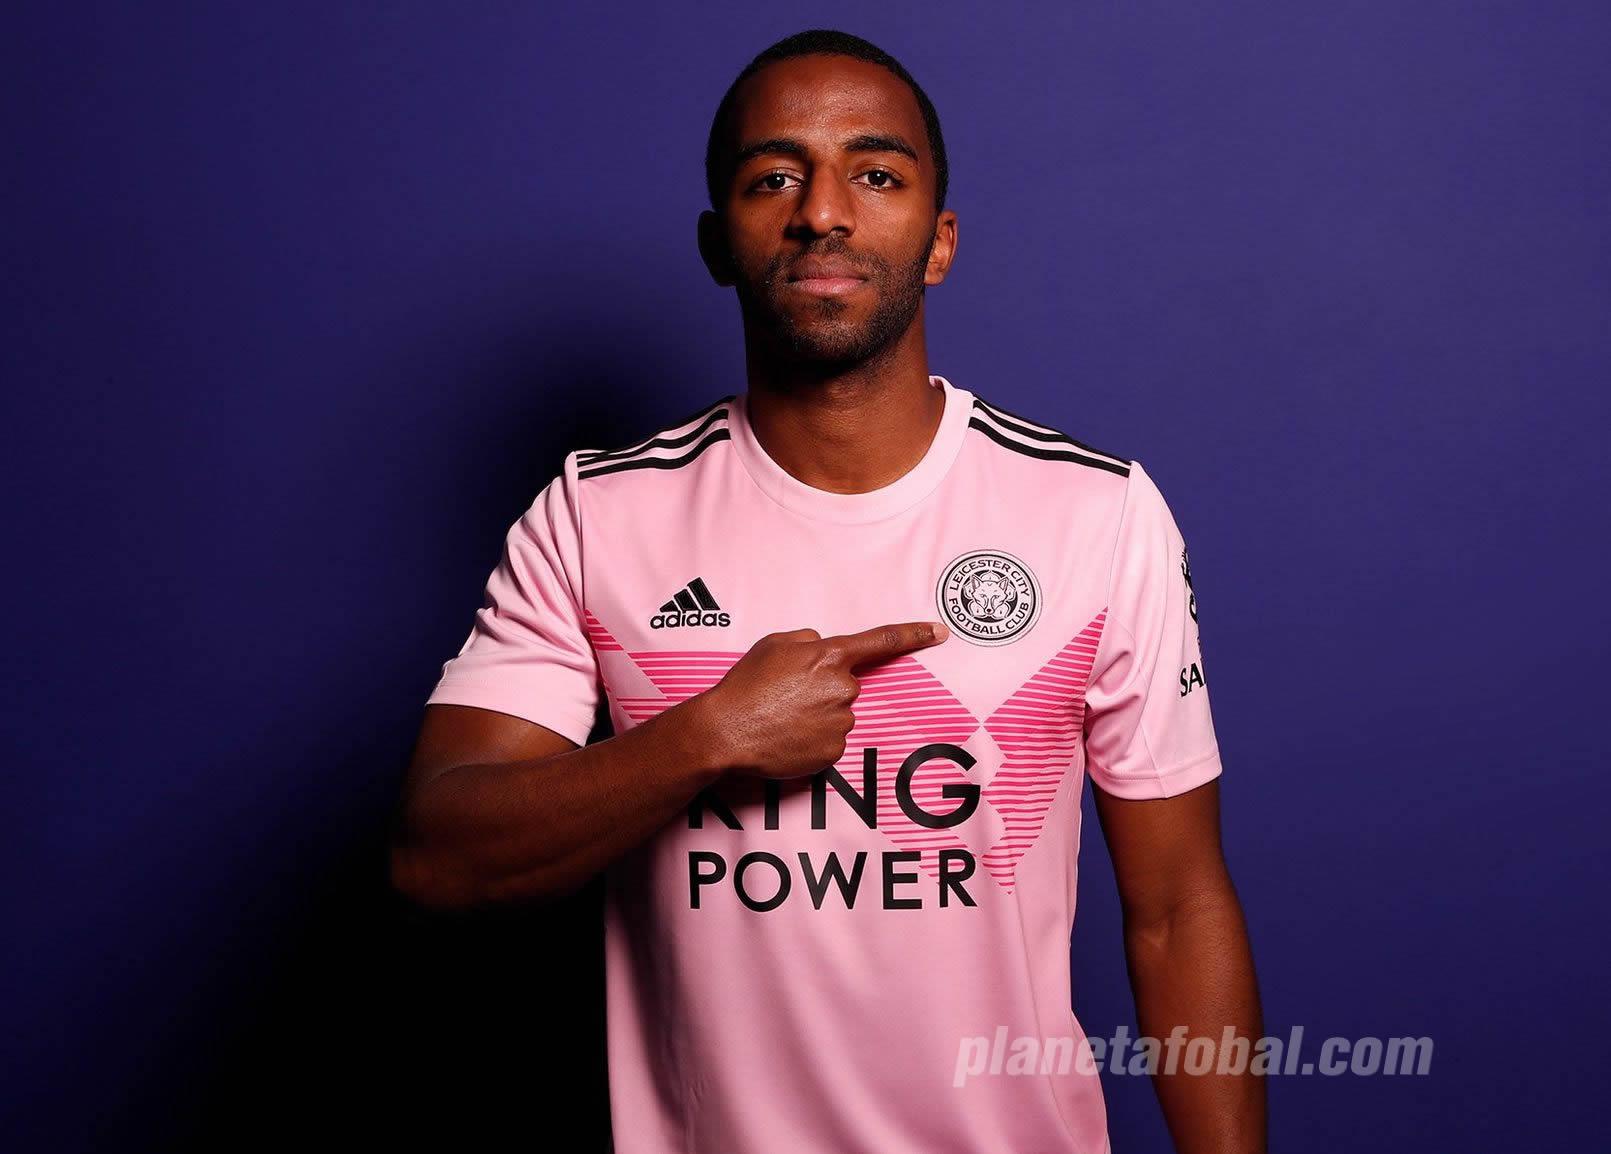 Camiseta Adidas rosa del Leicester City 2019/2020 | Imagen Web Oficial